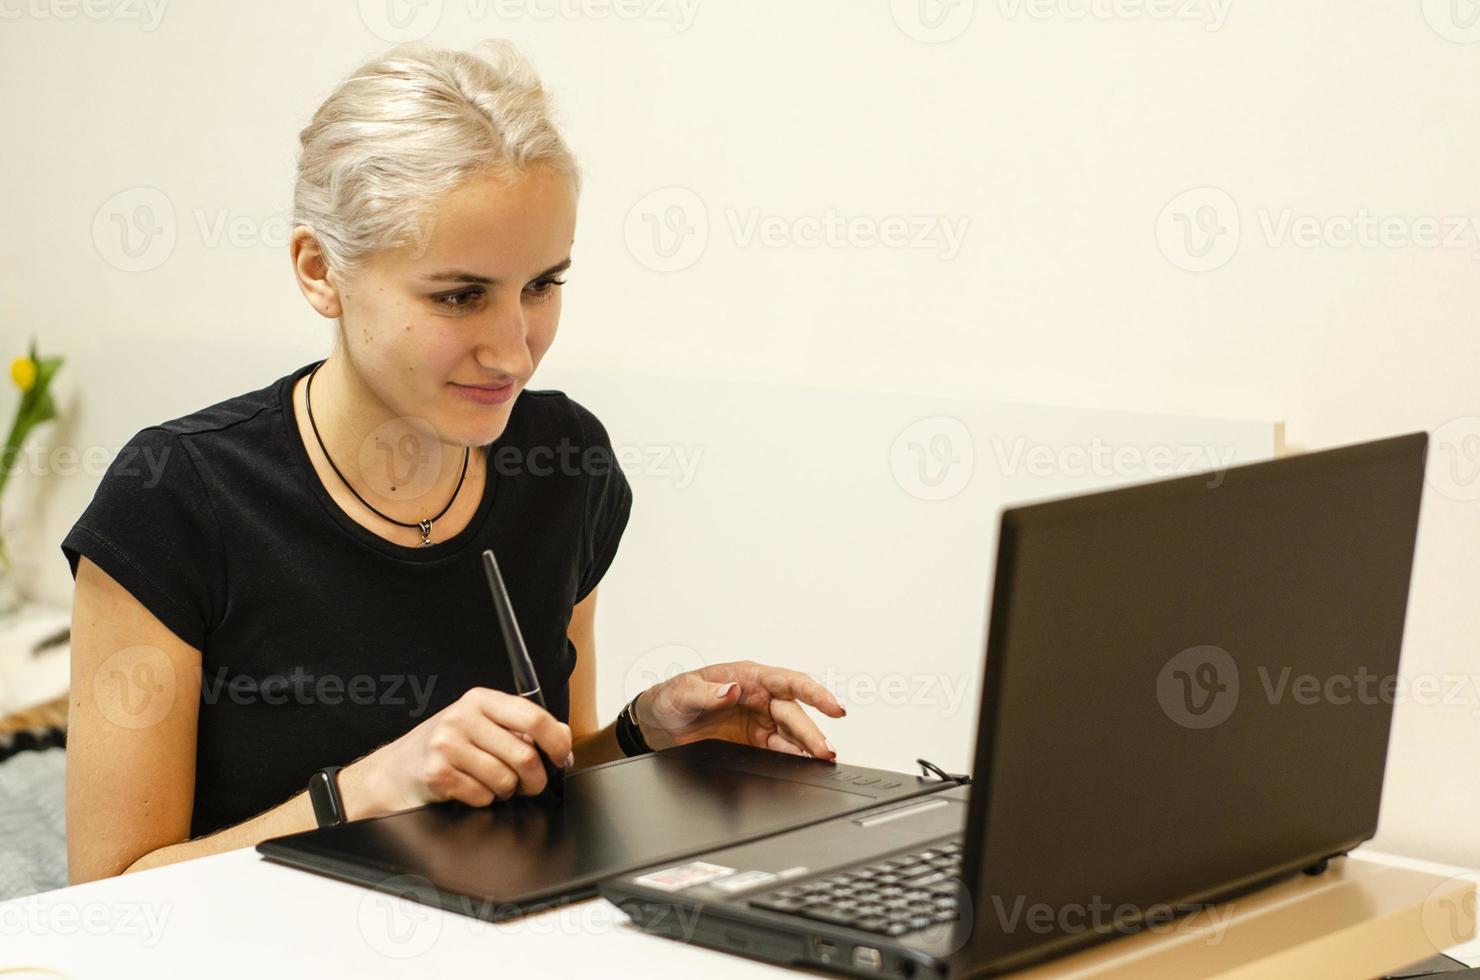 la niña aprende a dibujar en una tableta gráfica. computadora portátil. foto